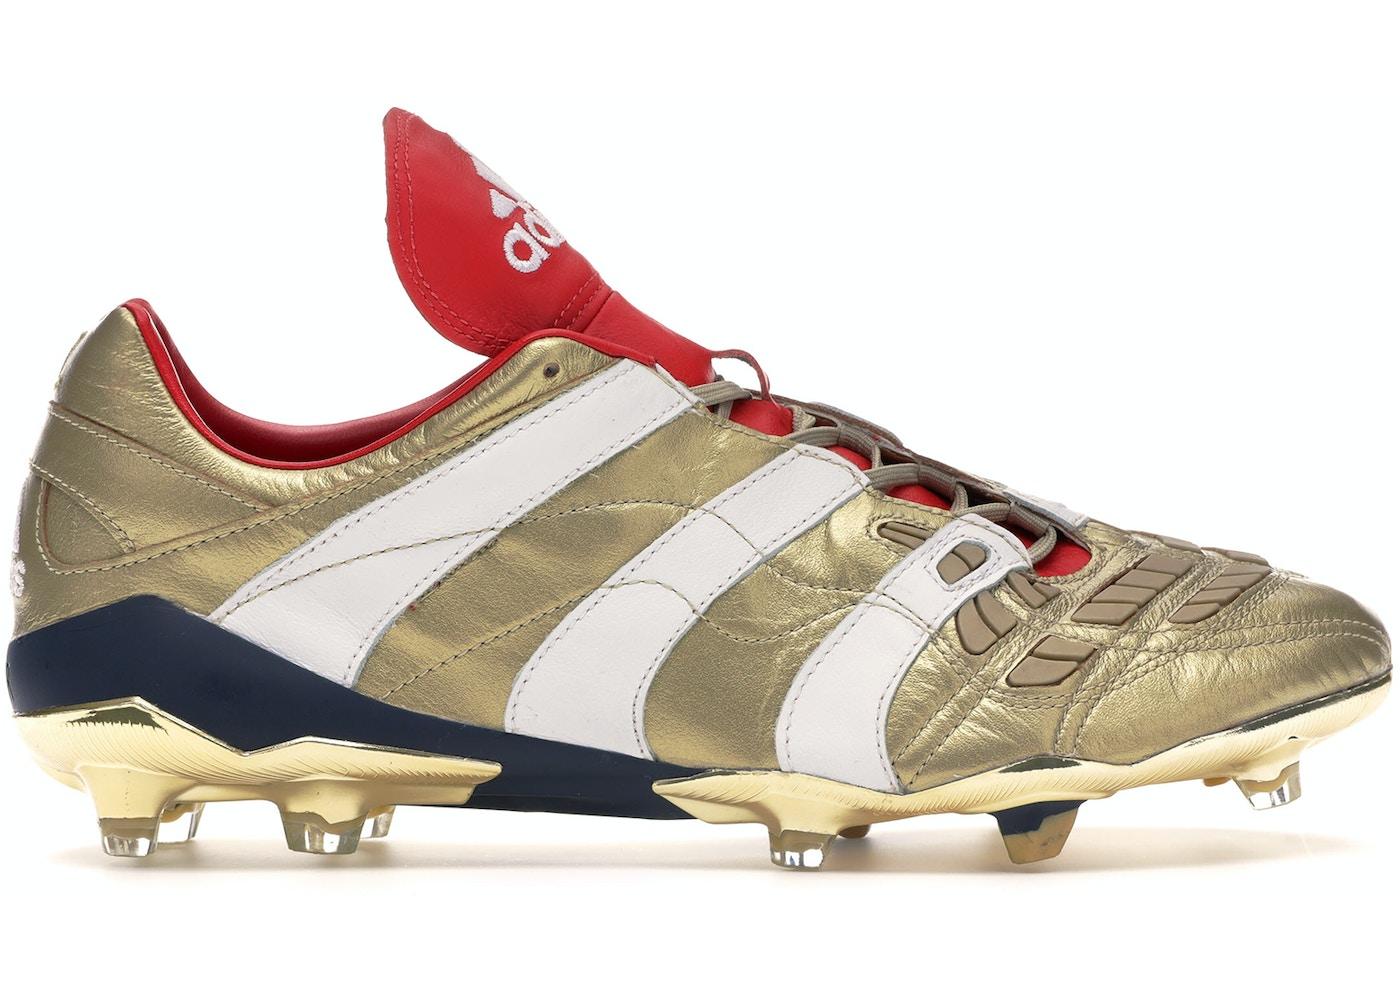 magasin en ligne 28f16 26323 adidas Predator Accelerator FG 25 Year Pack Zidane